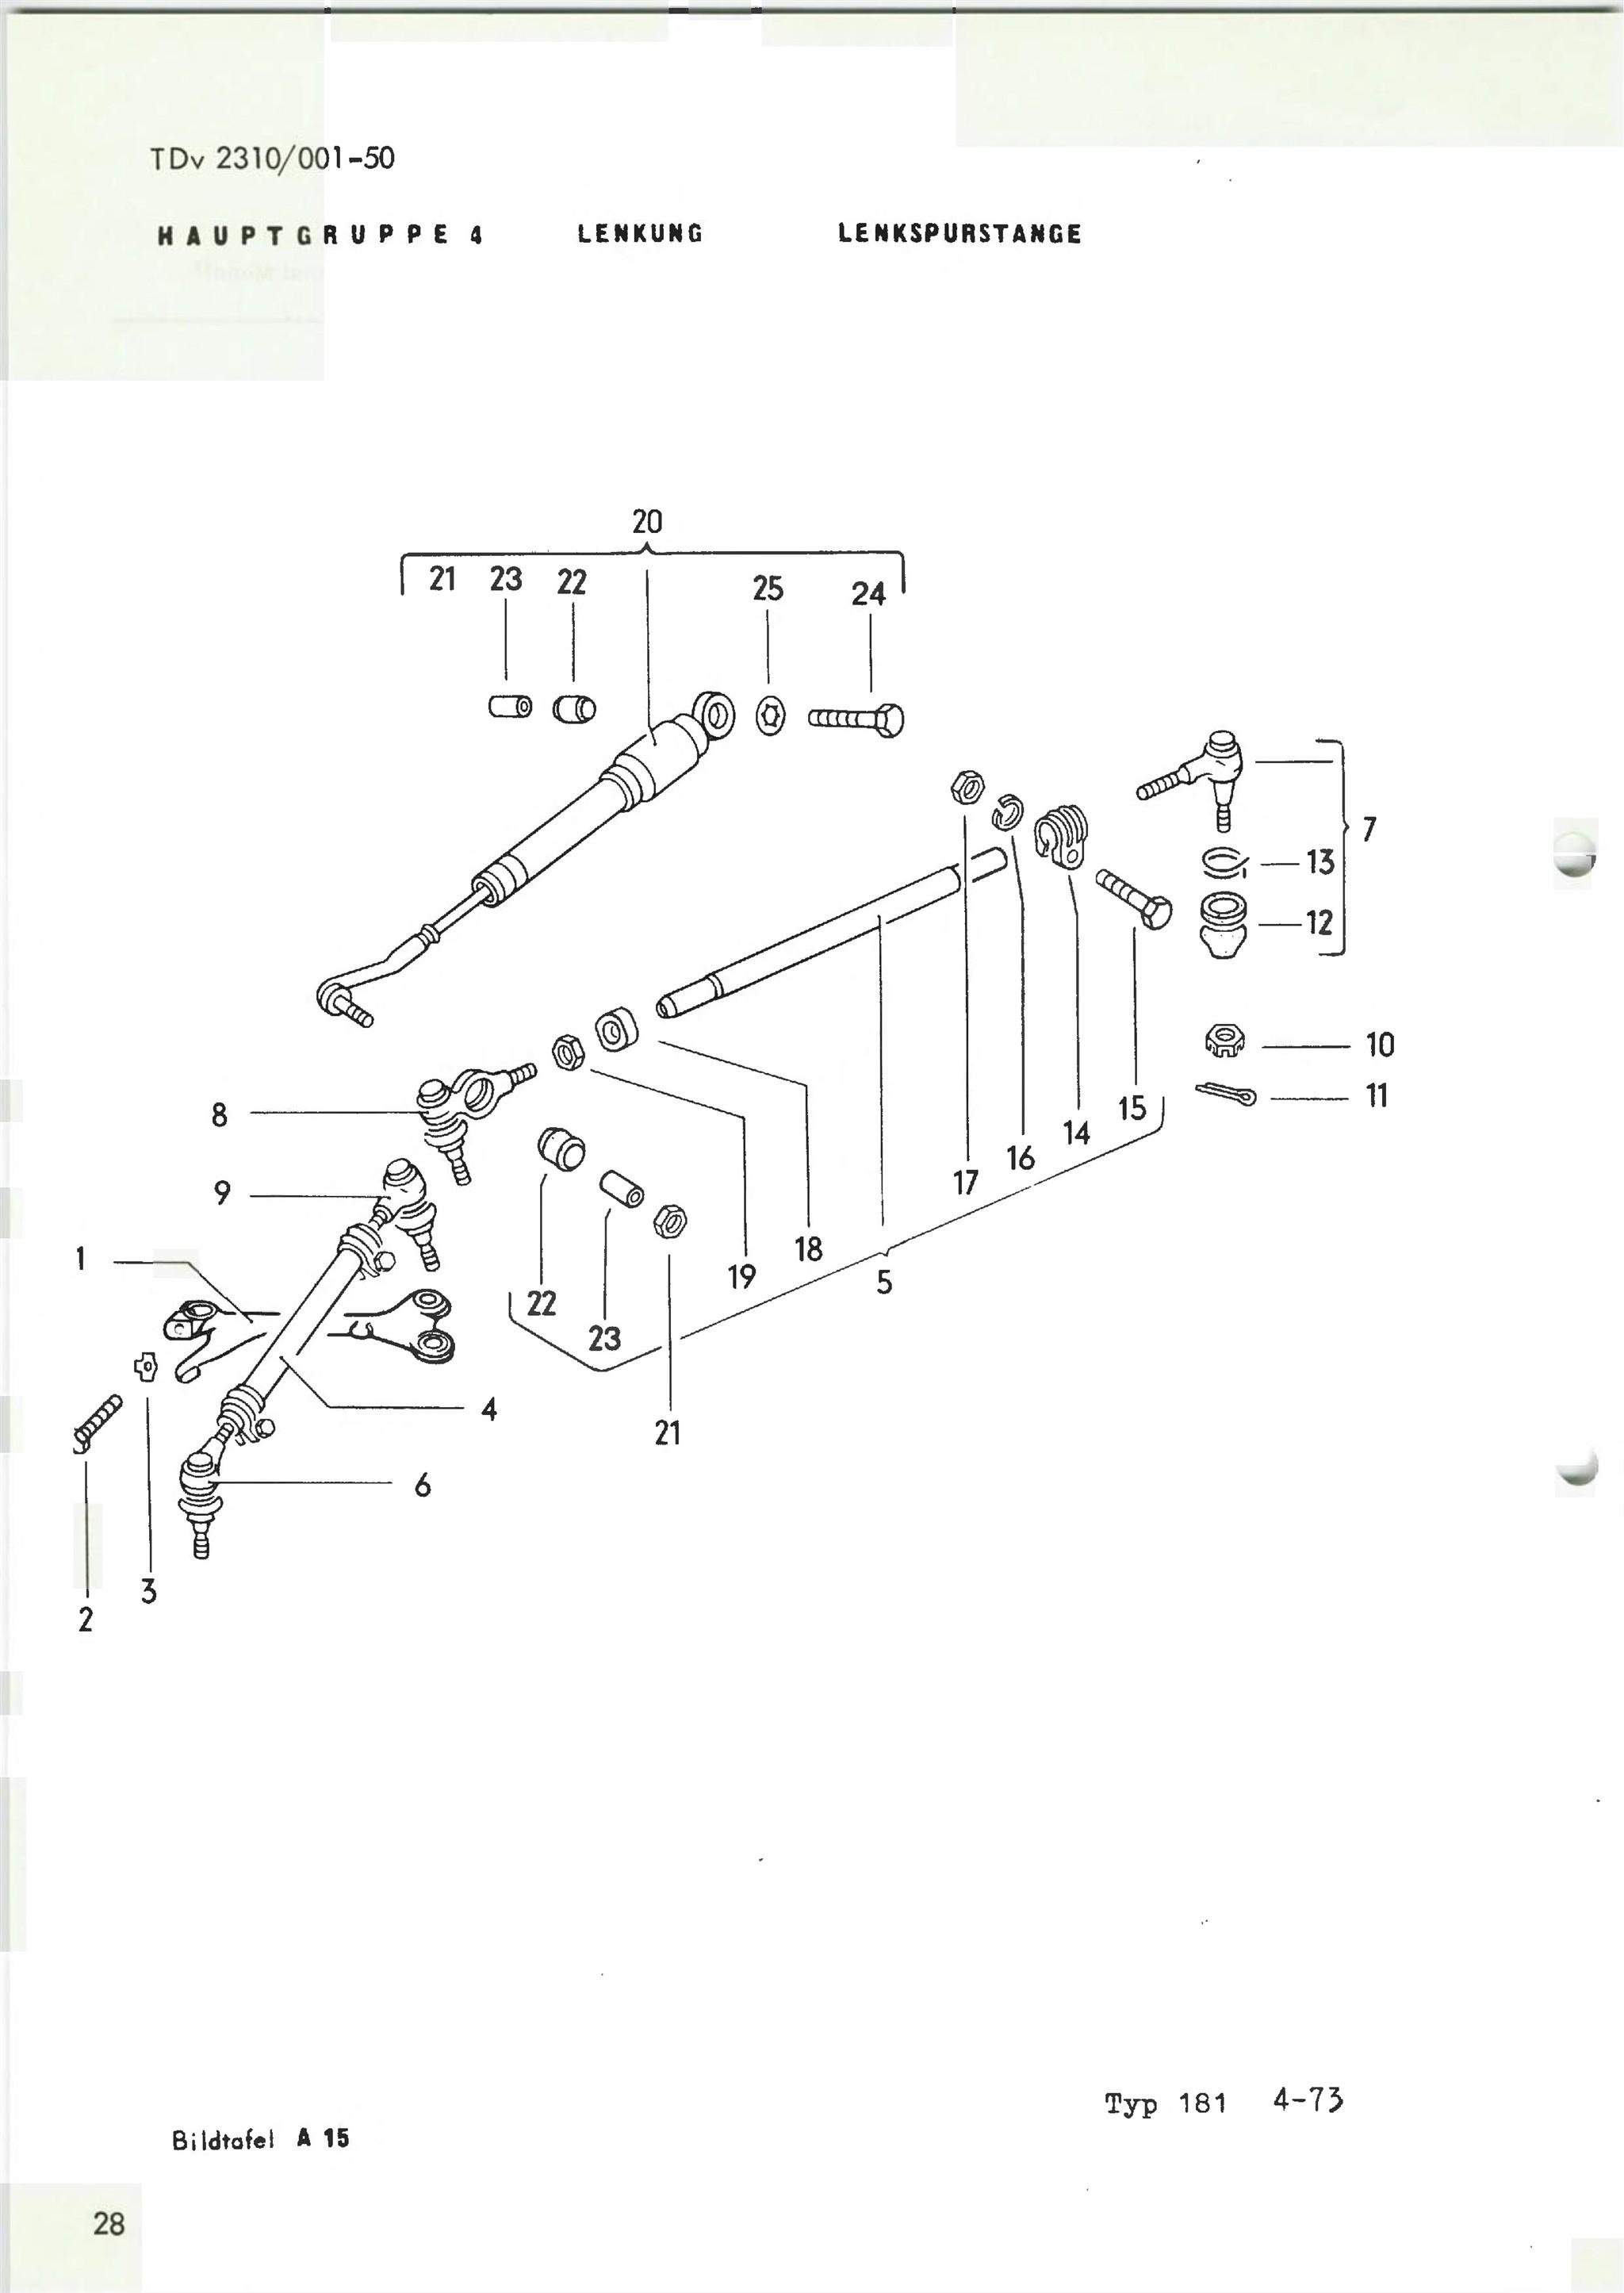 Thesamba Vw 181 German Army Parts Catalog